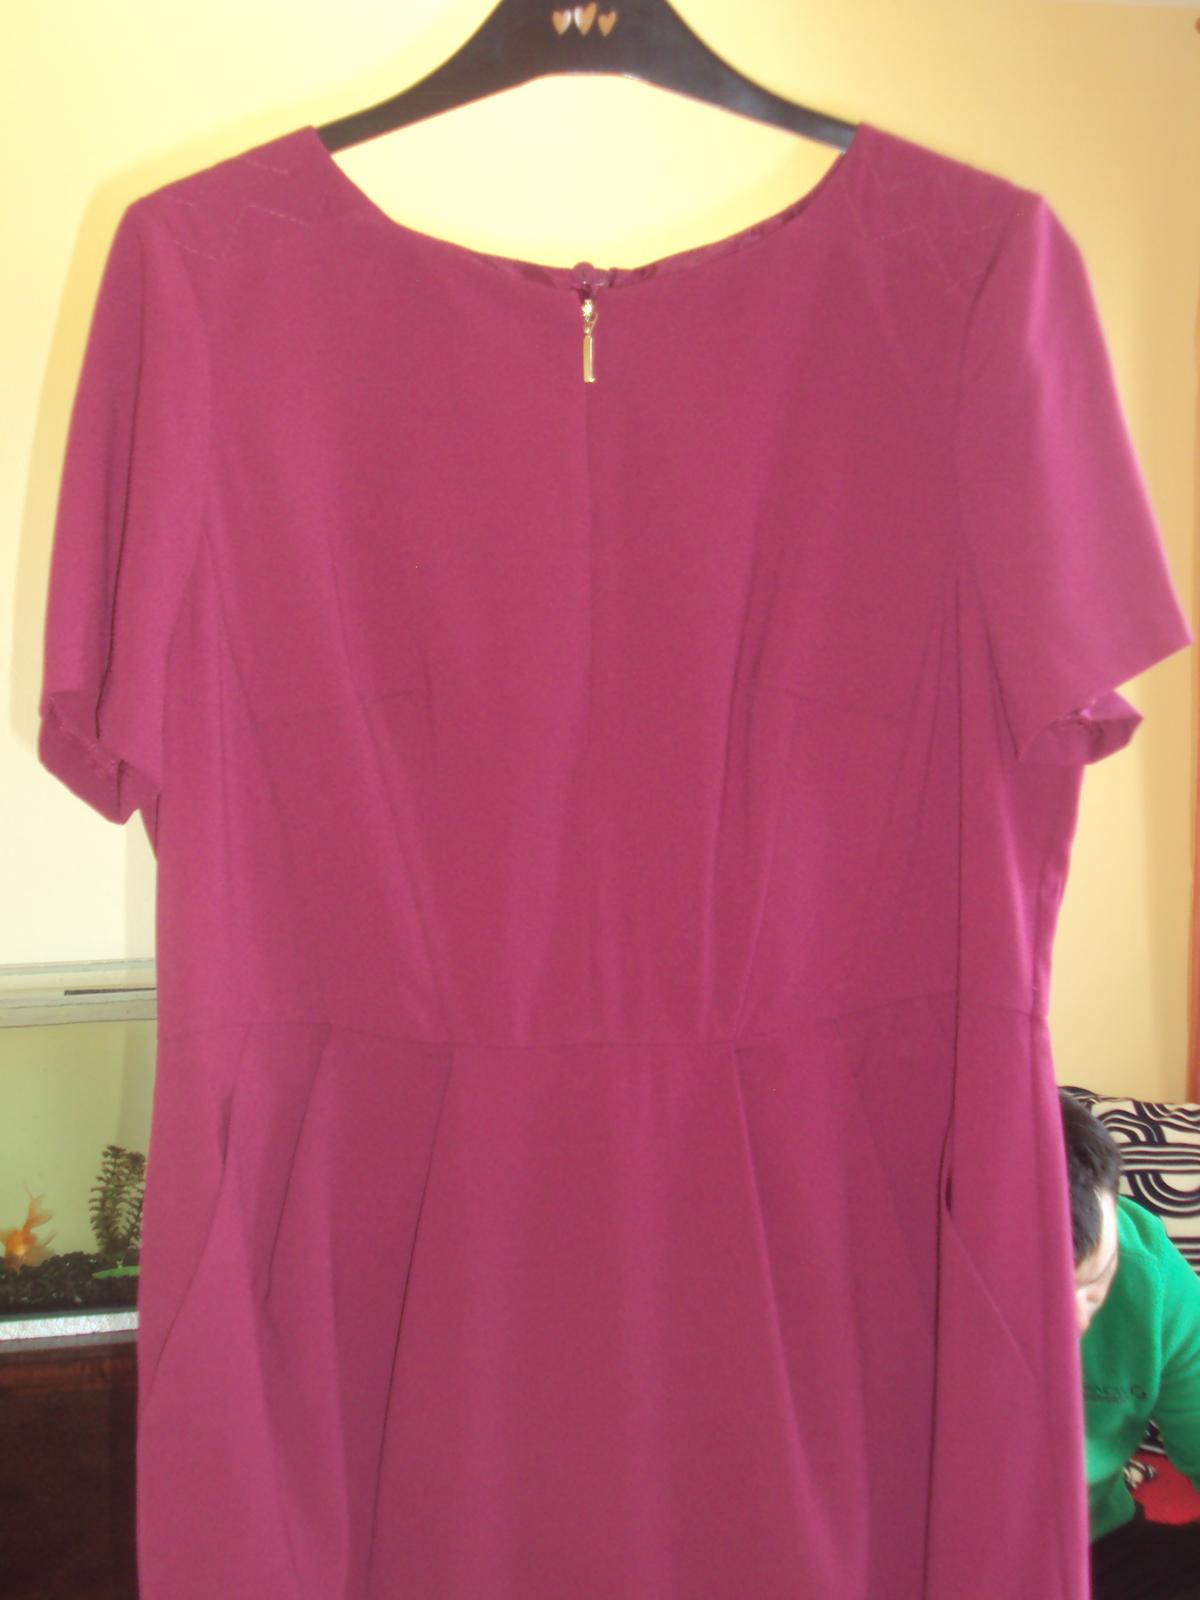 Šaty zn. M&S - Obrázok č. 1